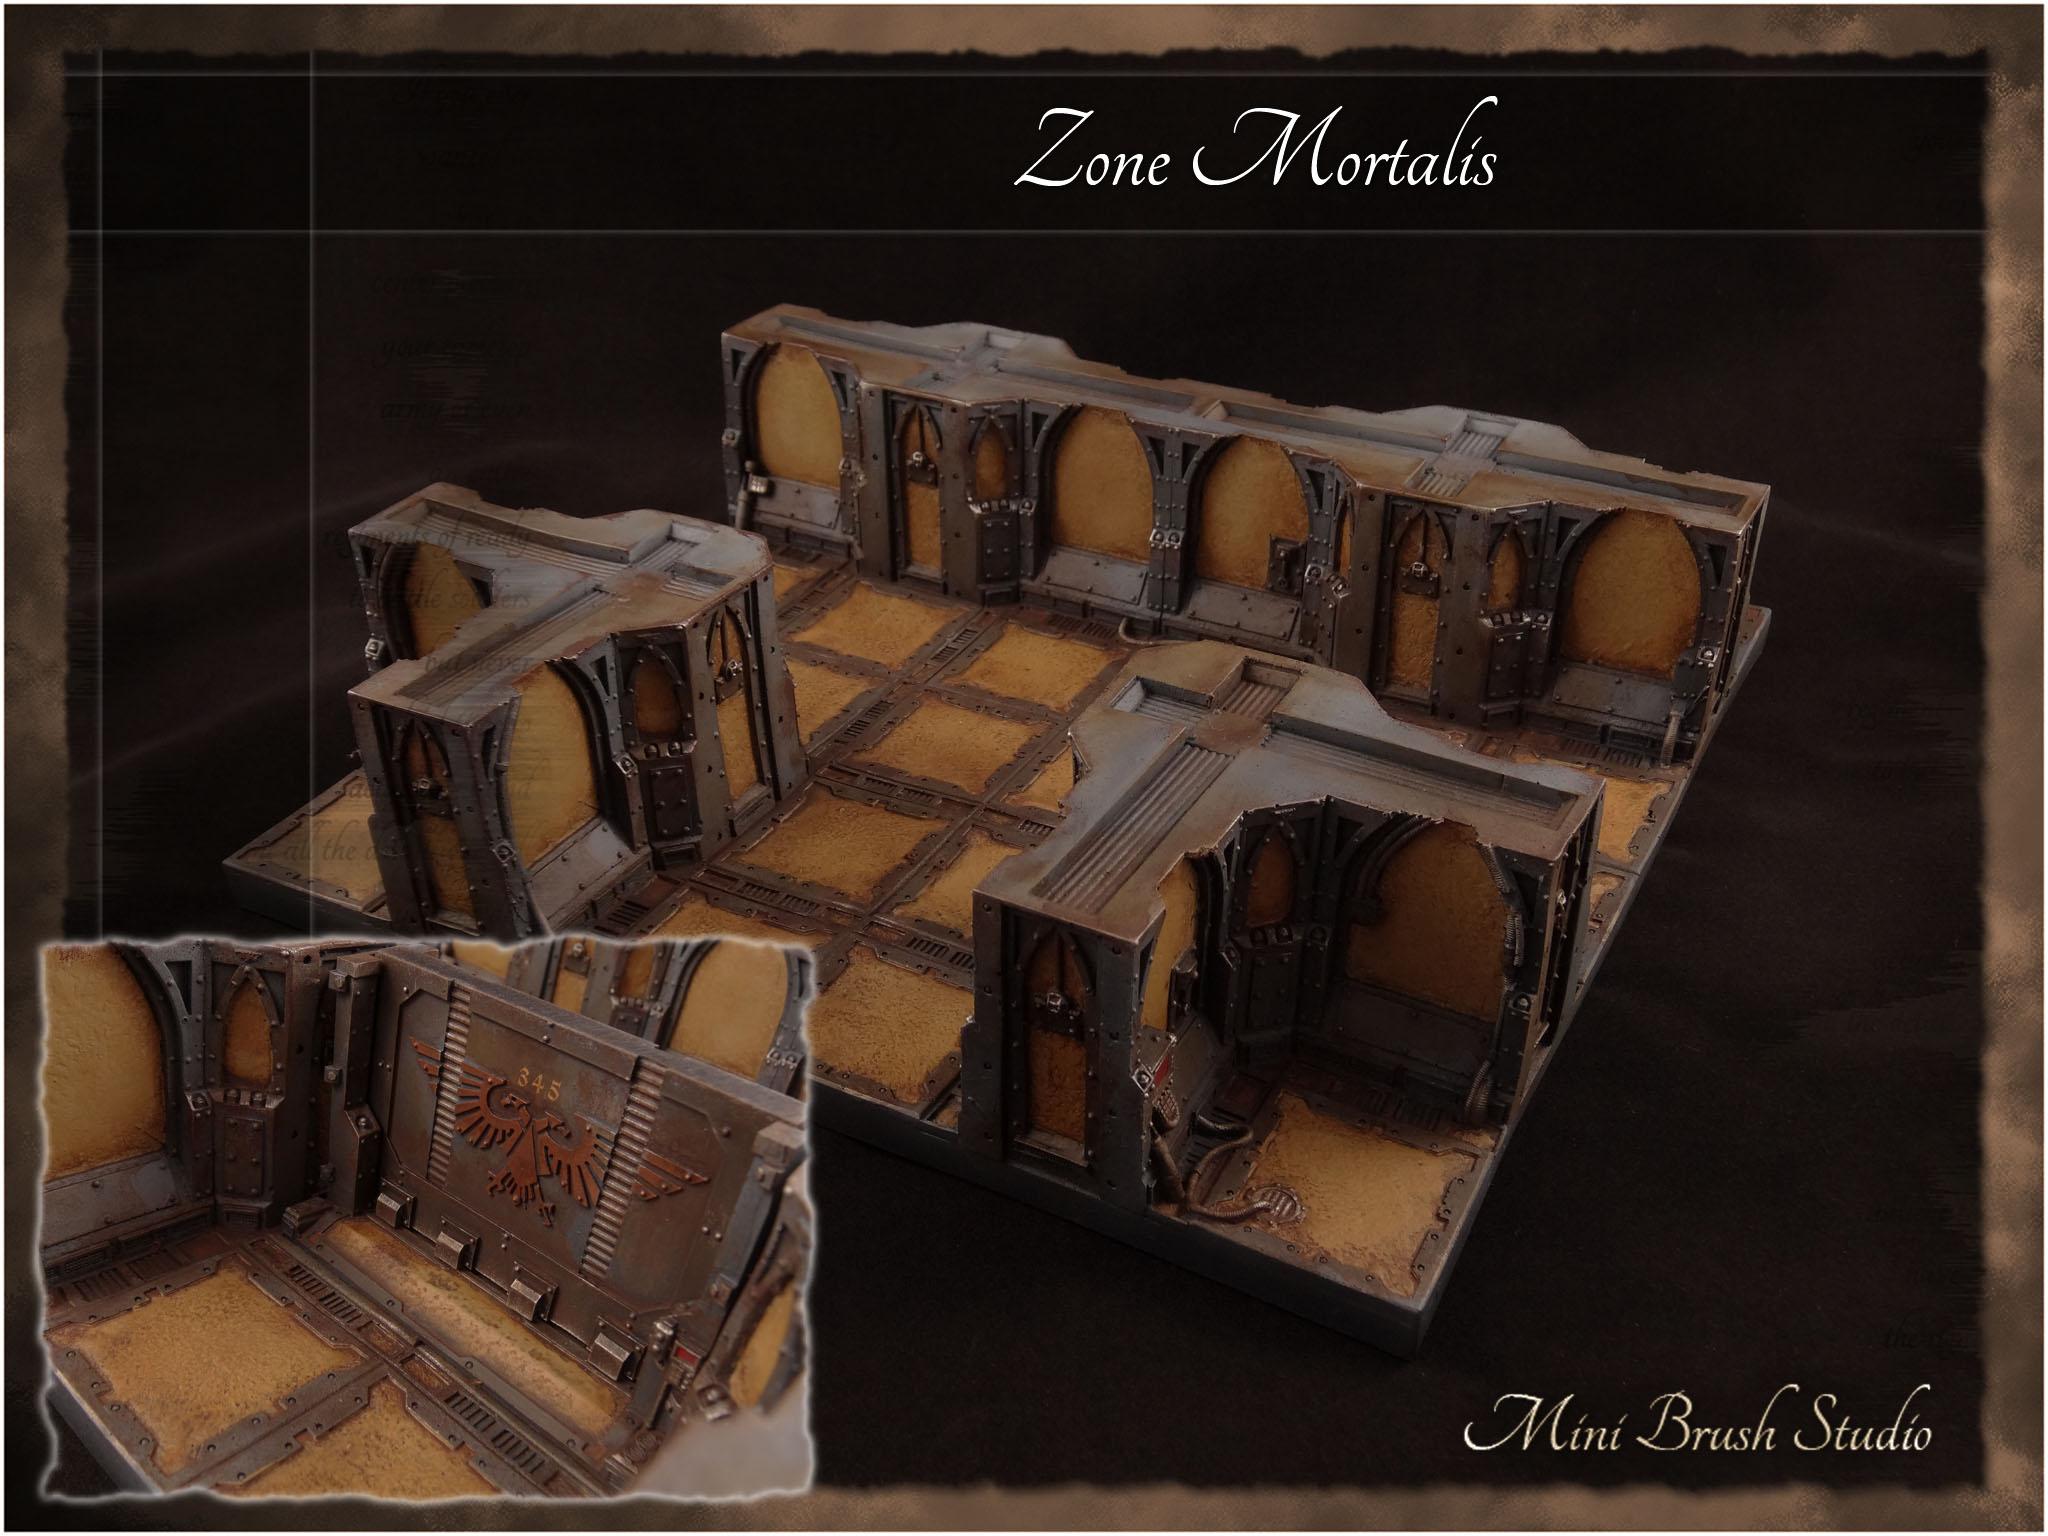 Zone Mortalis 1a v7.jpg